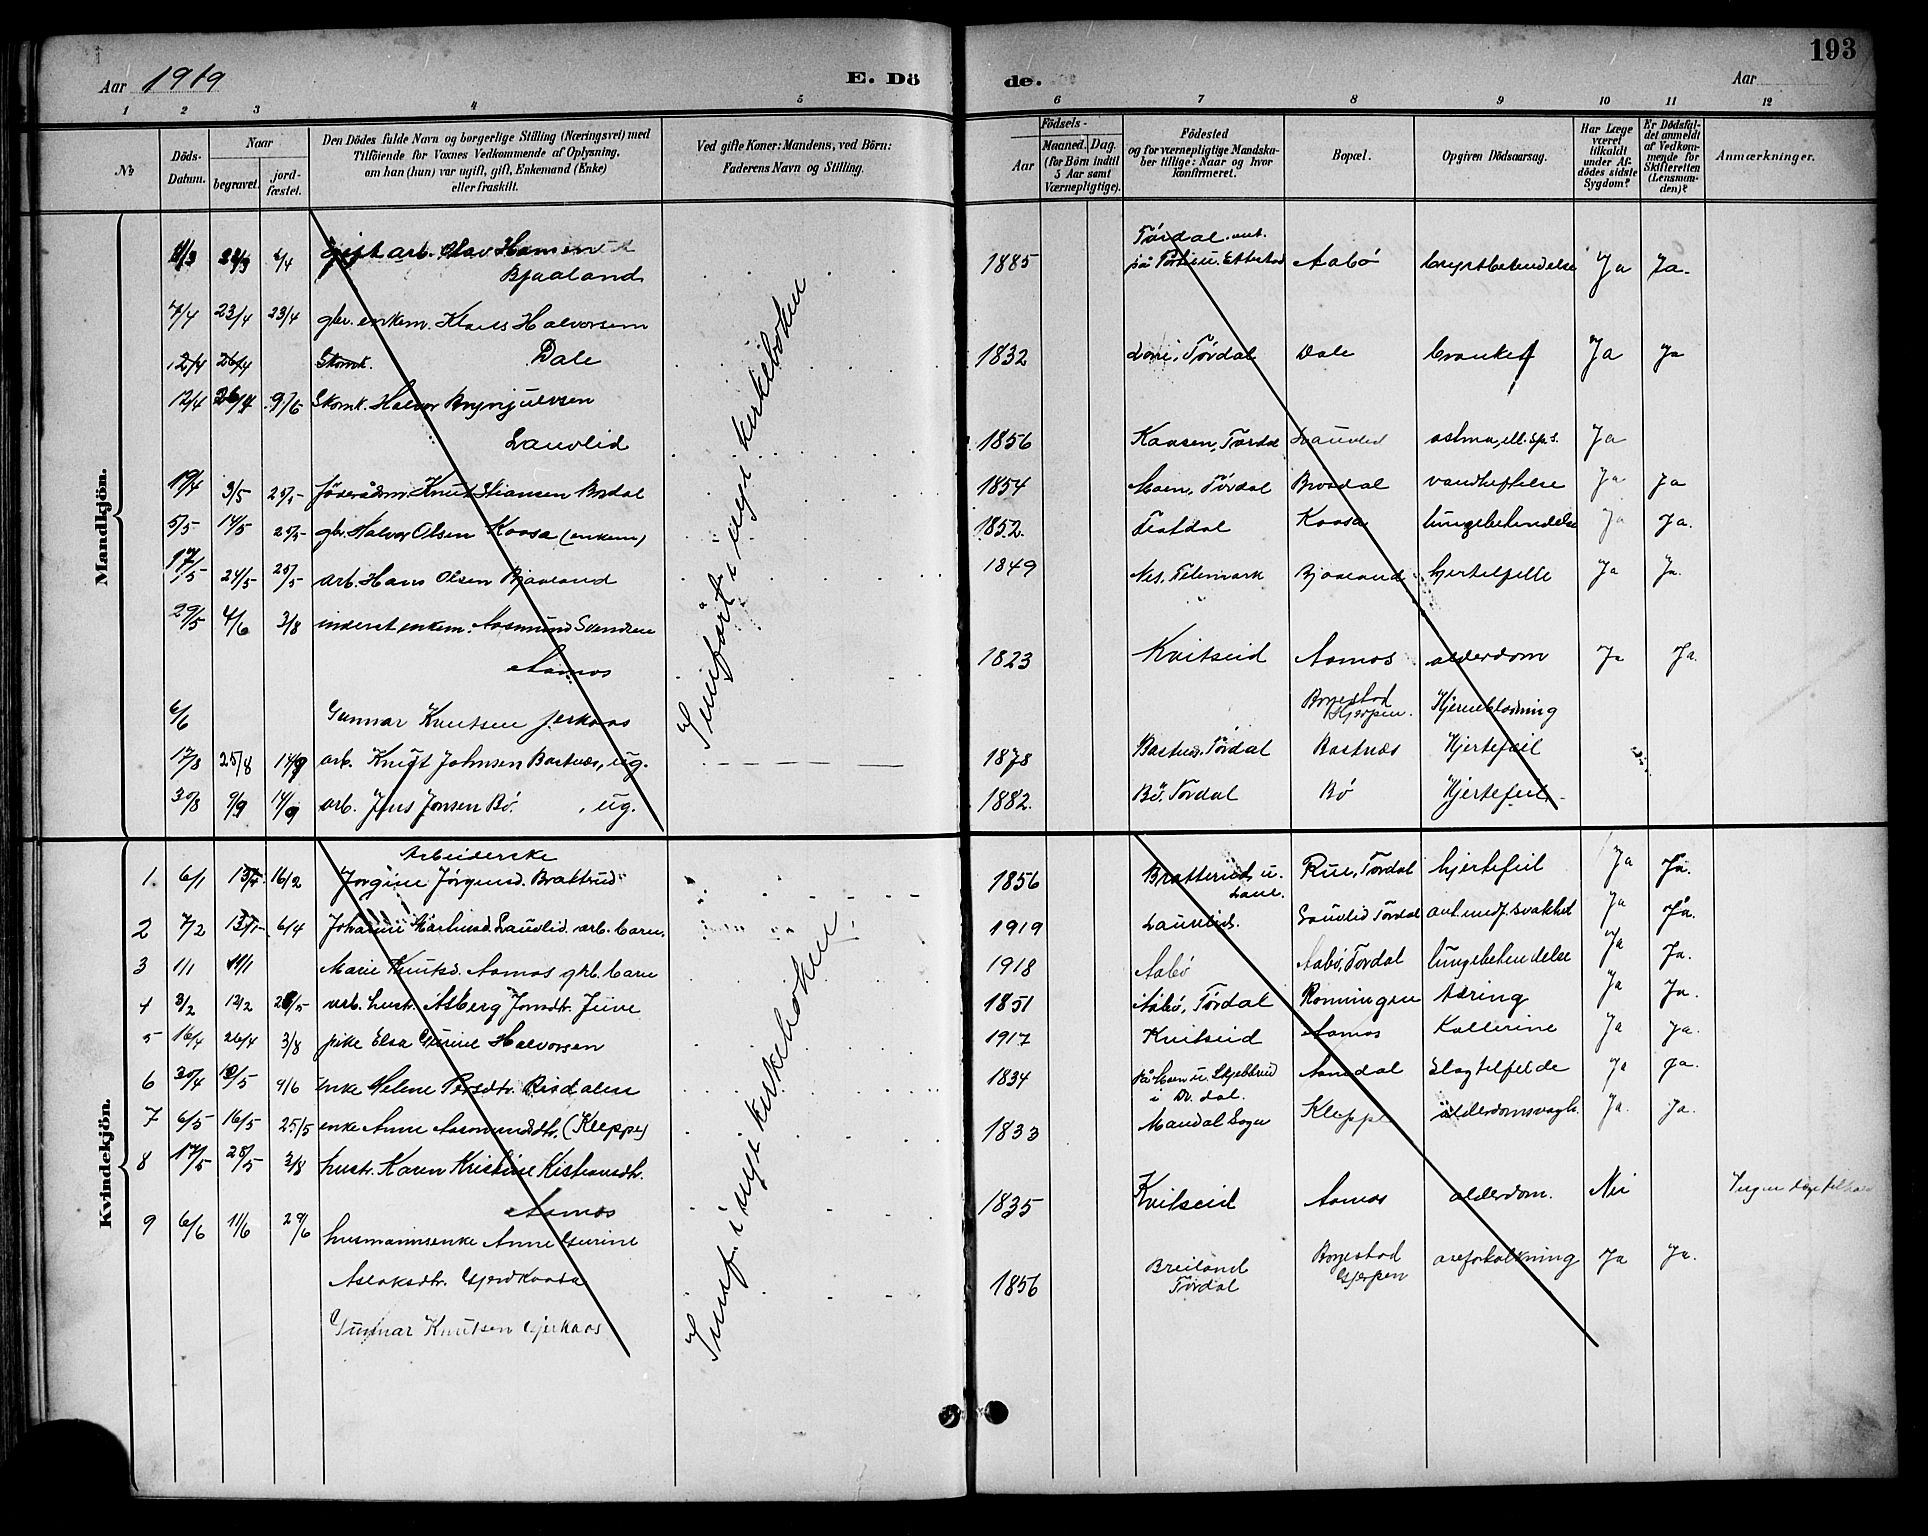 SAKO, Drangedal kirkebøker, G/Gb/L0002: Klokkerbok nr. II 2, 1895-1918, s. 193